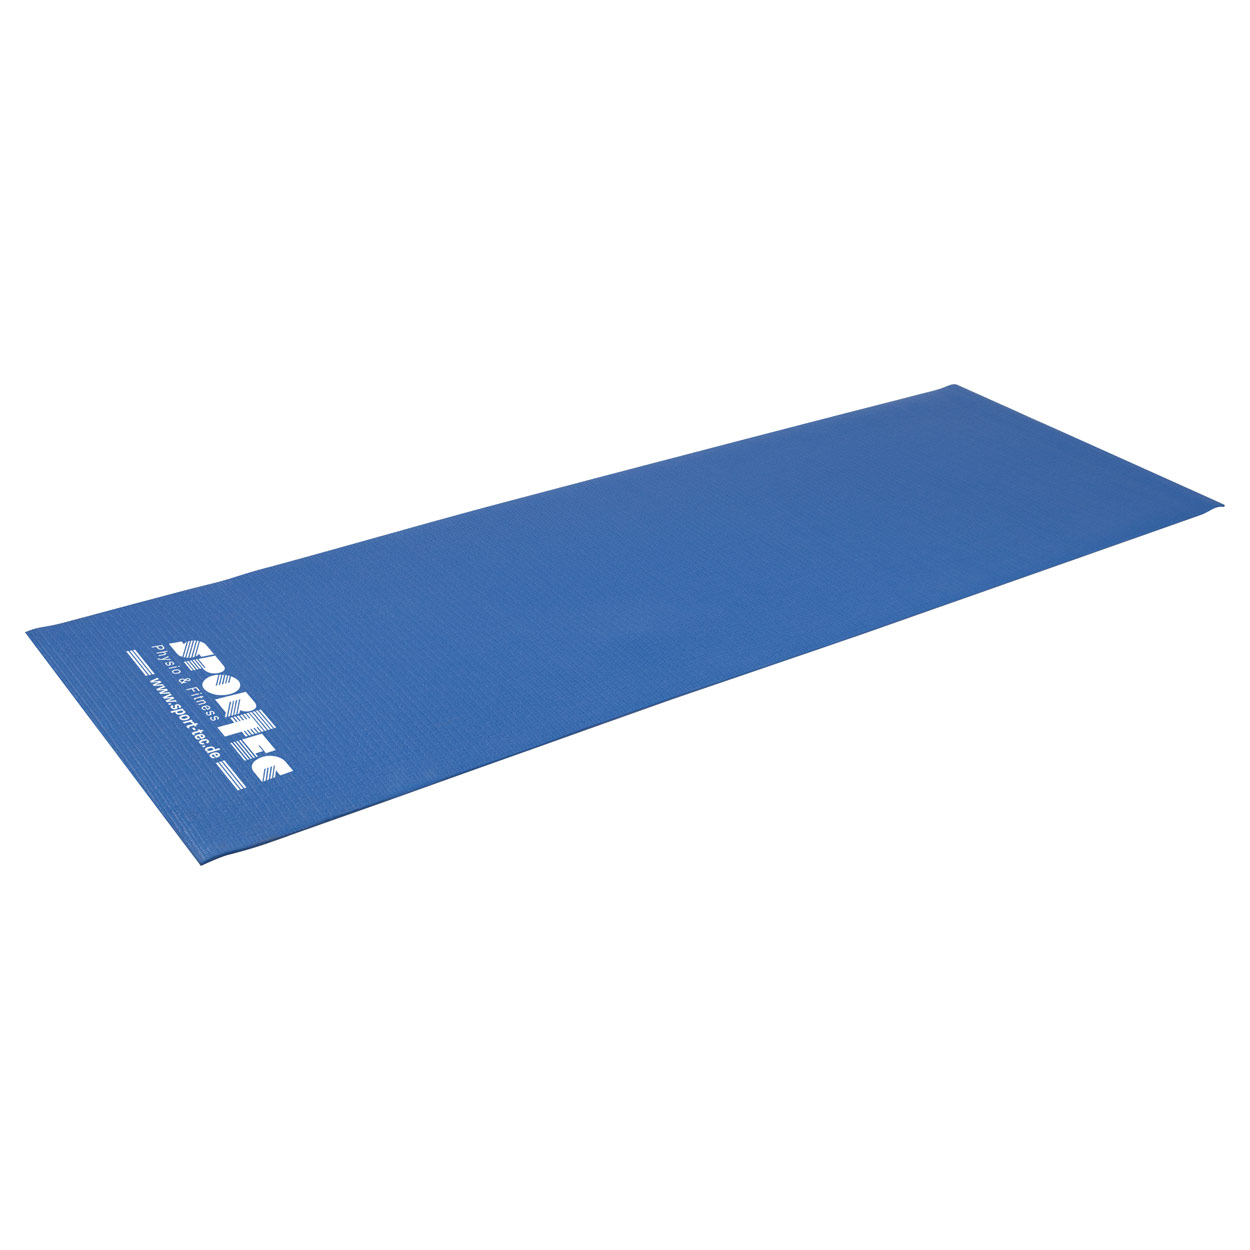 Sport Tec Yogamatte inkl. Tragegurt, LxBxH 220x220x20,20 cm günstig ...